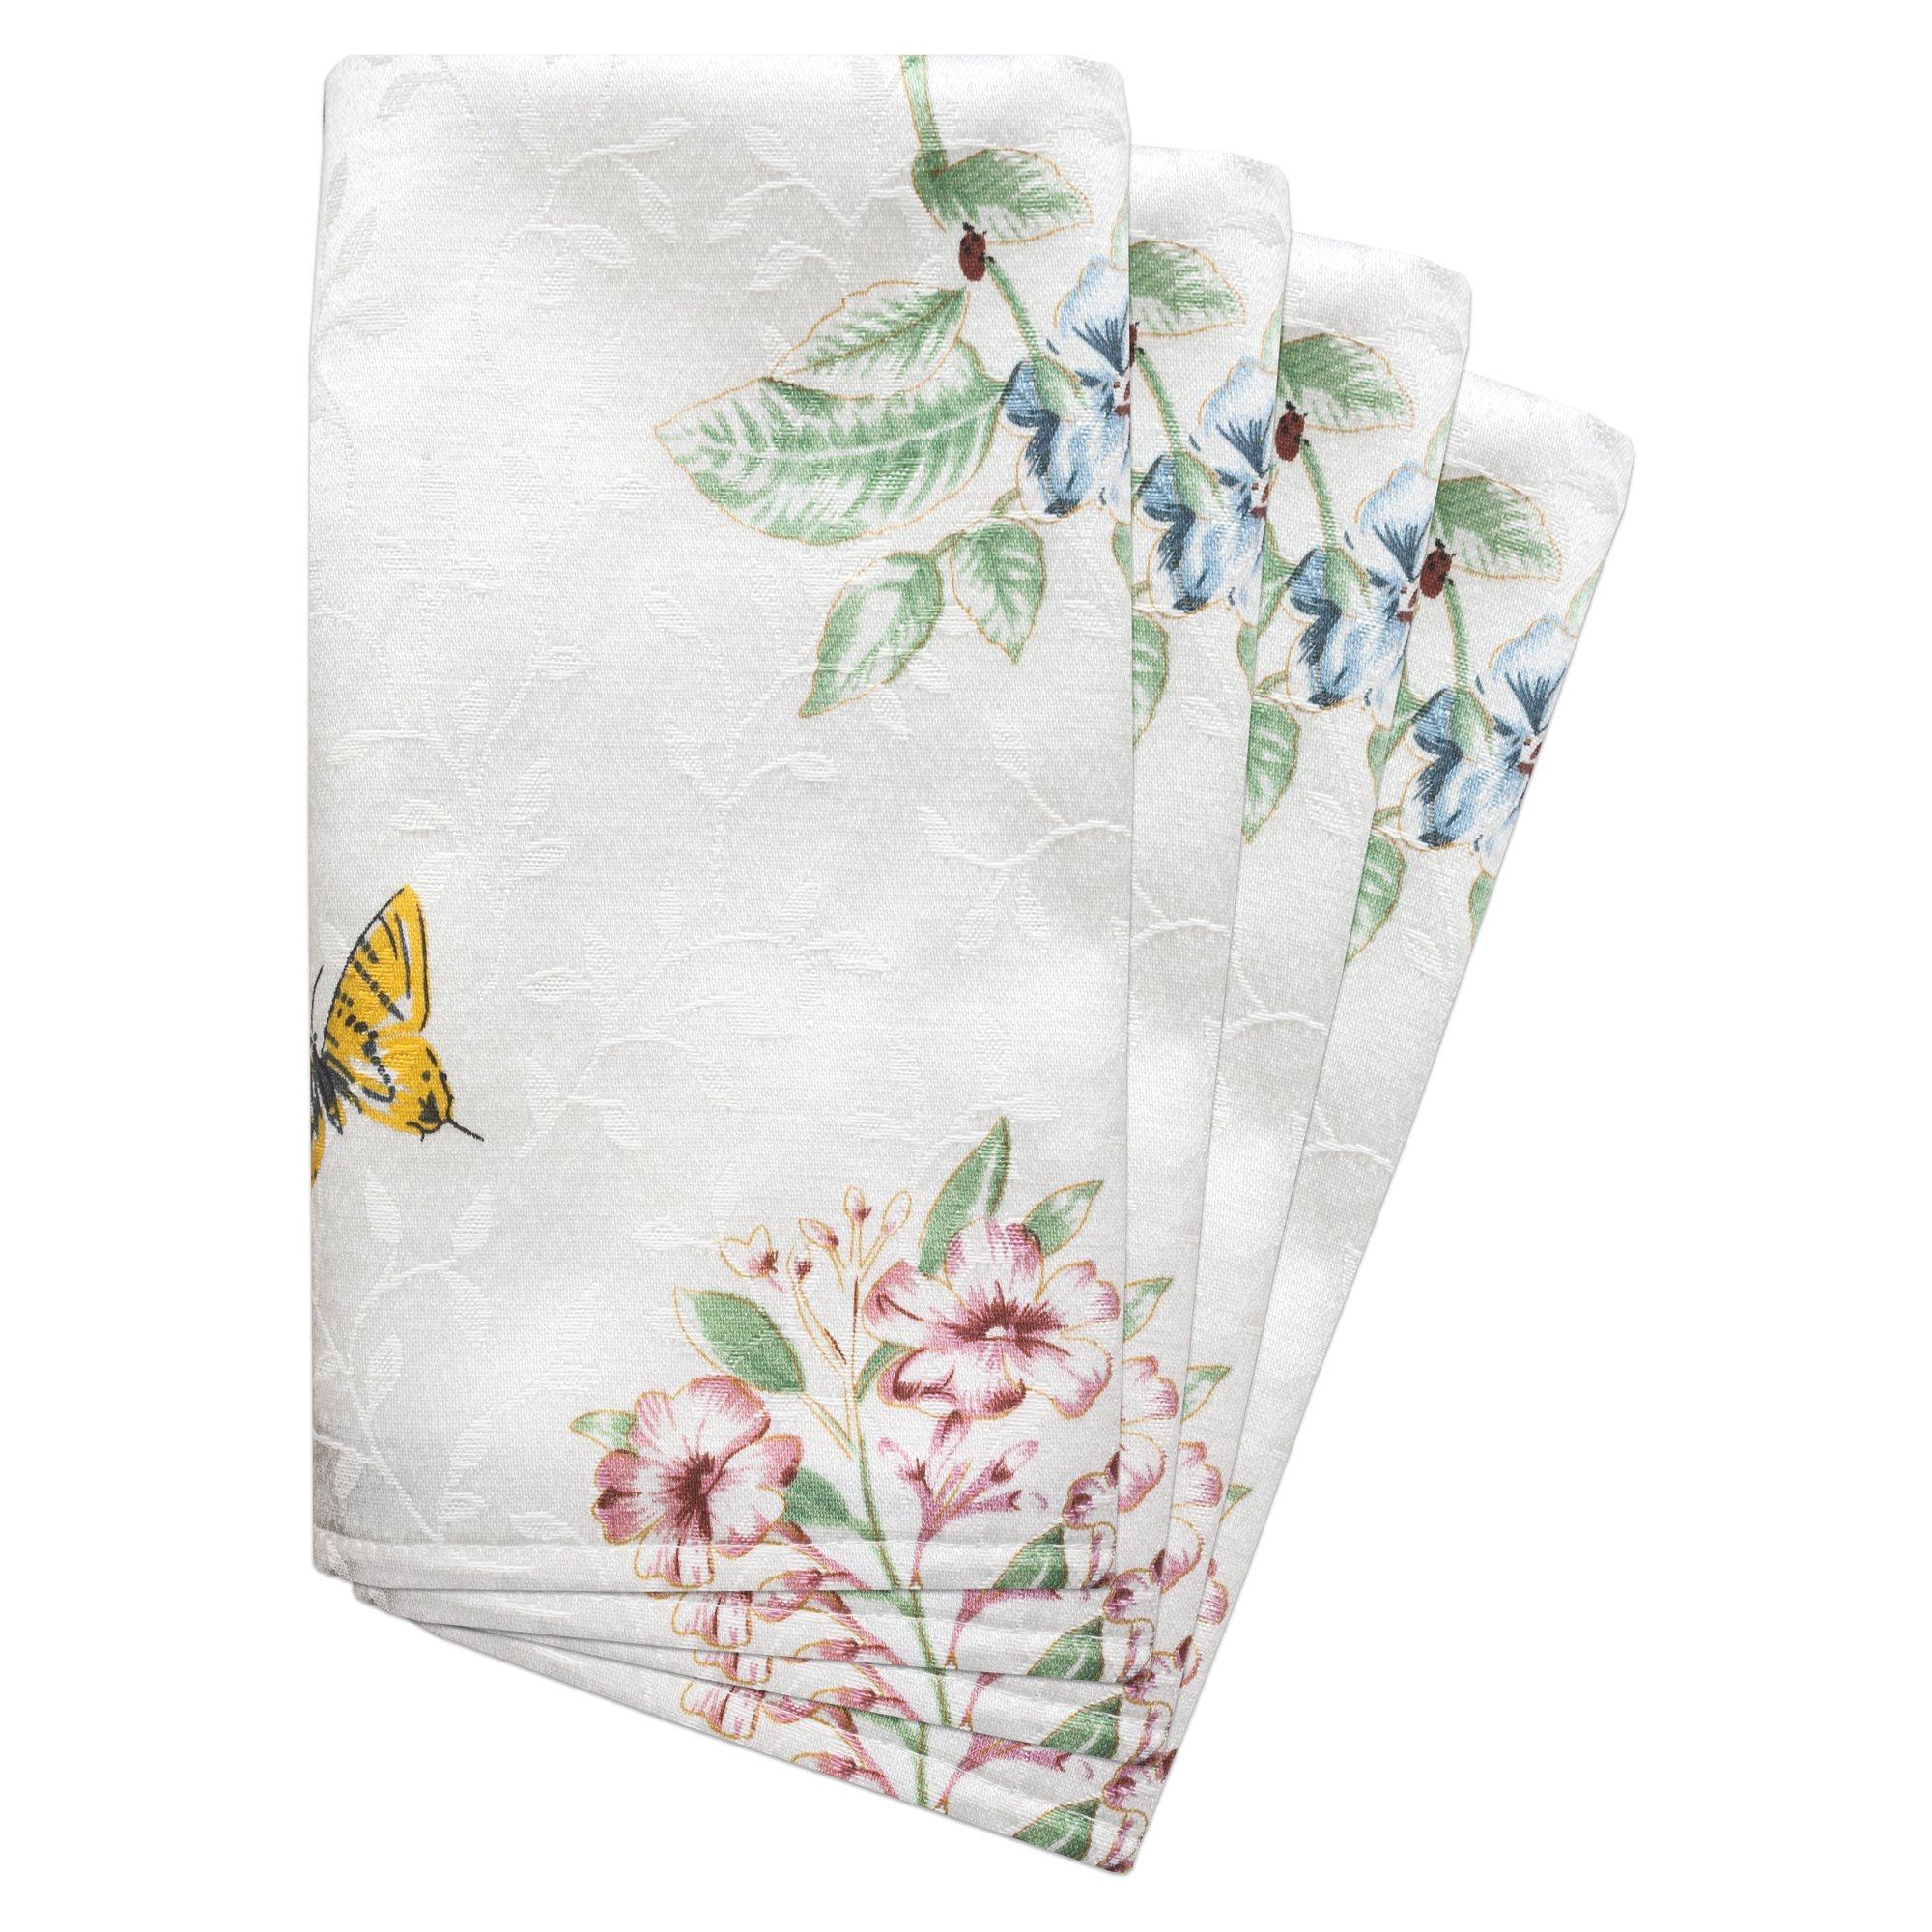 Lenox Butterfly Meadow Set of 4 Napkins